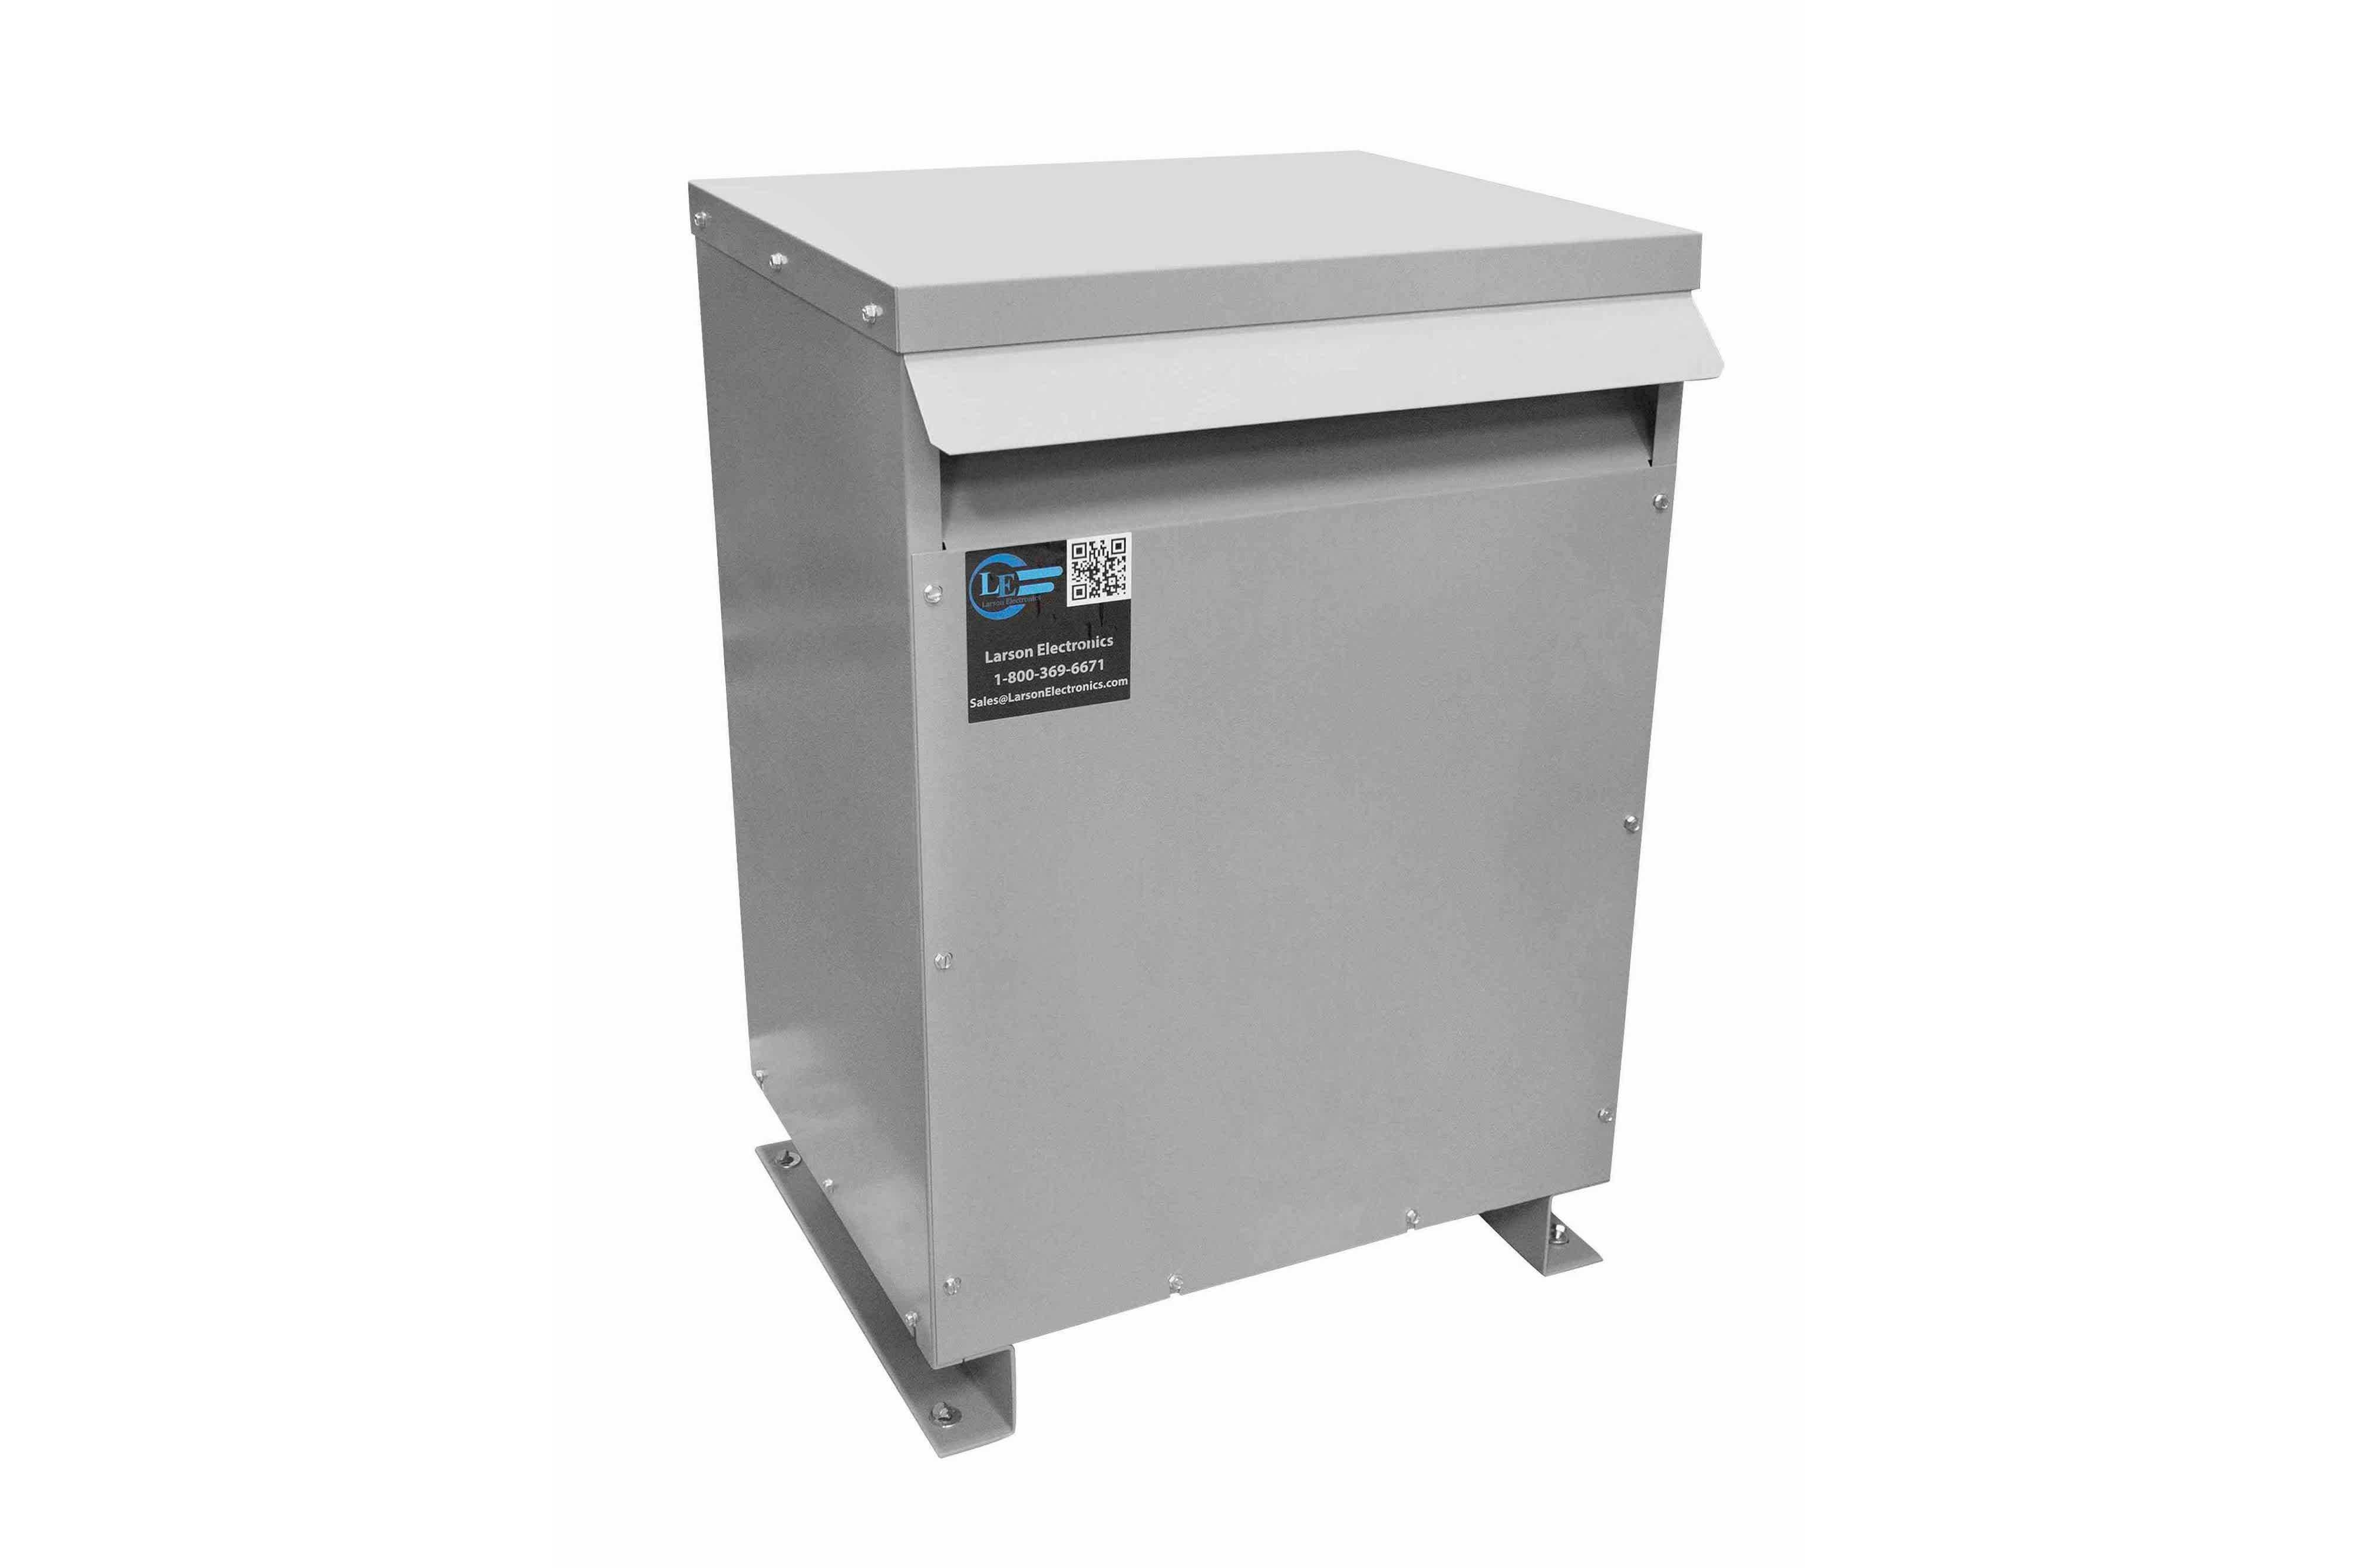 36 kVA 3PH Isolation Transformer, 600V Wye Primary, 208V Delta Secondary, N3R, Ventilated, 60 Hz